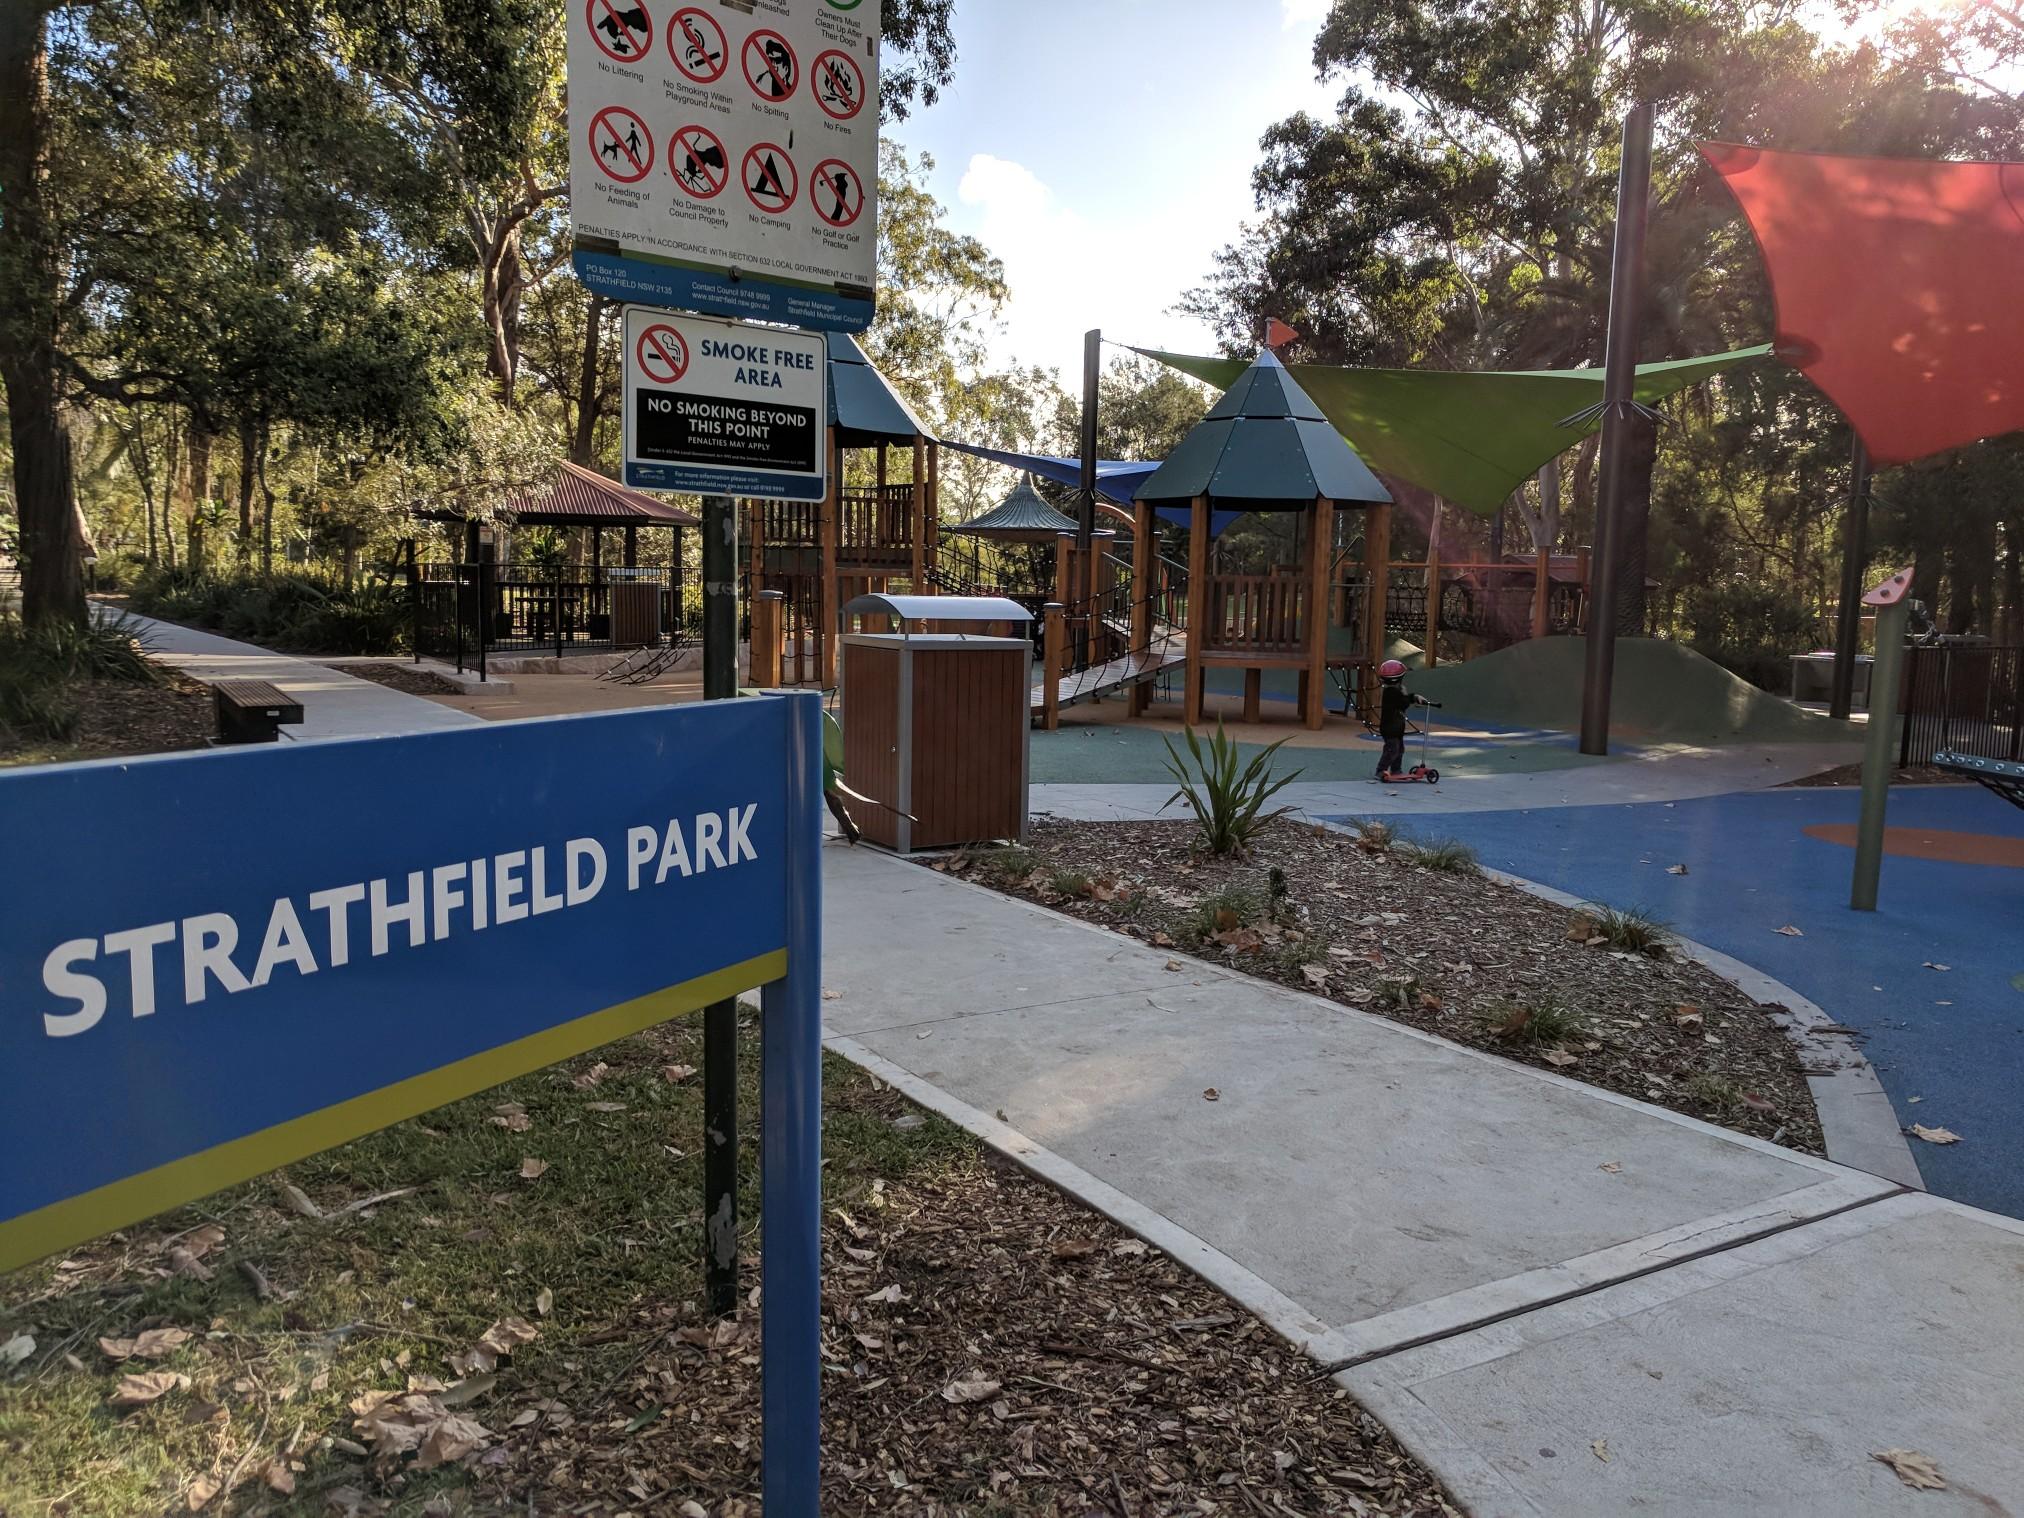 Strathfield Park